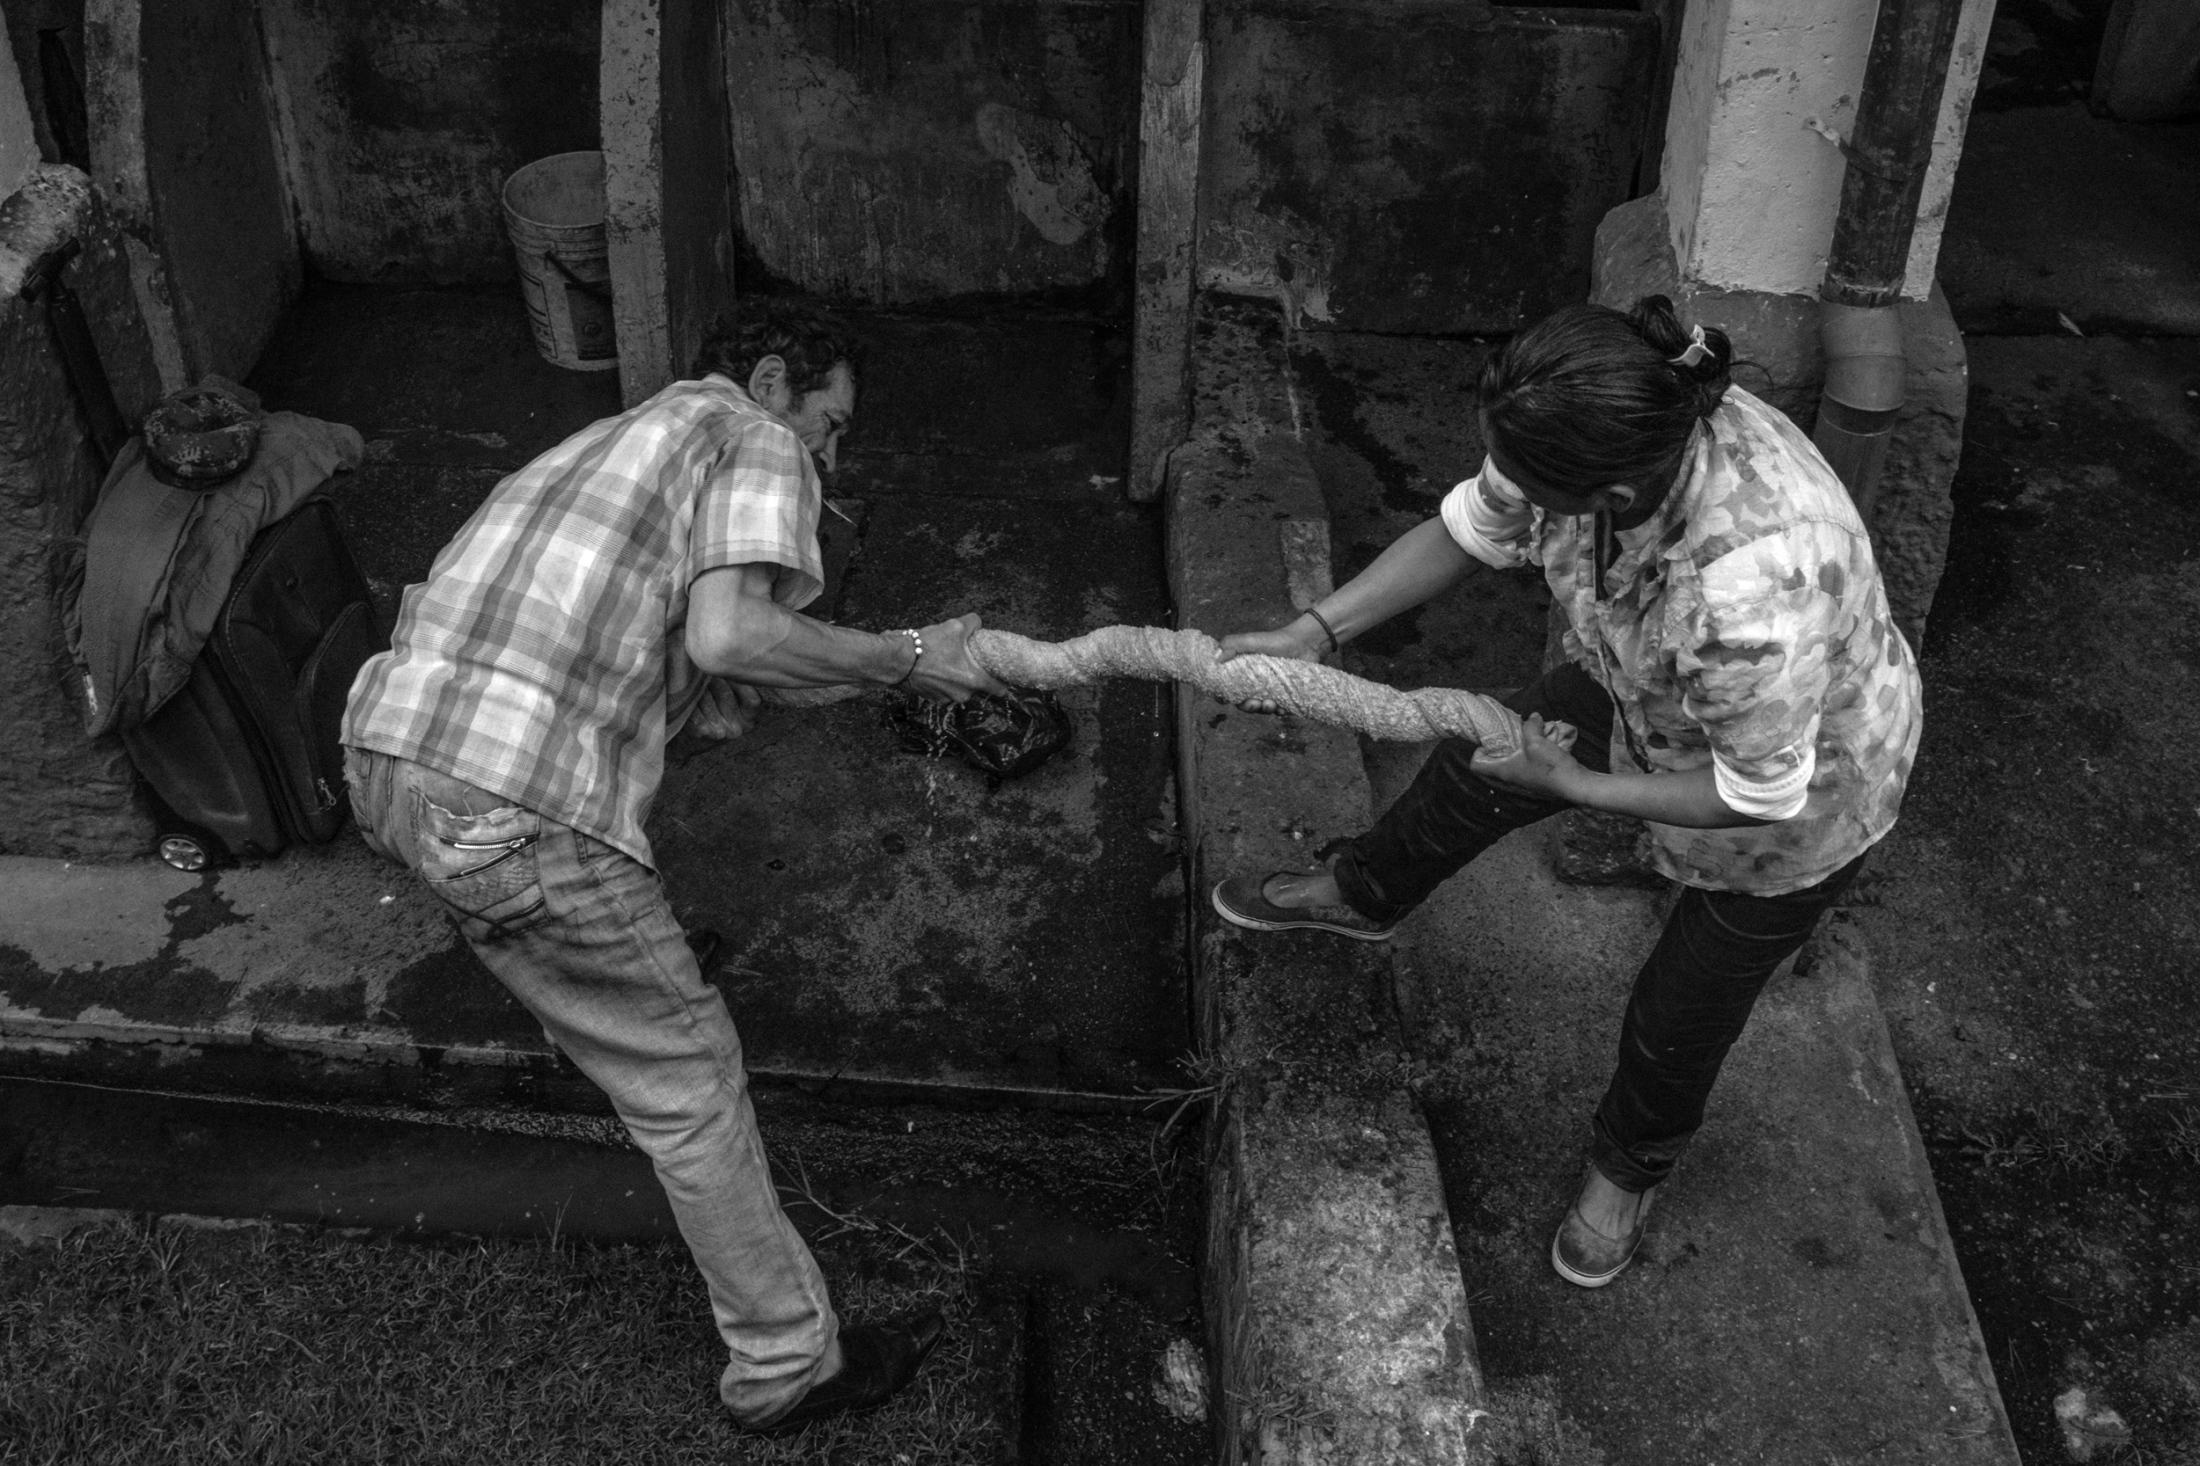 Art and Documentary Photography - Loading ZuletaR__os_CarangasYElJaguar_013.JPG